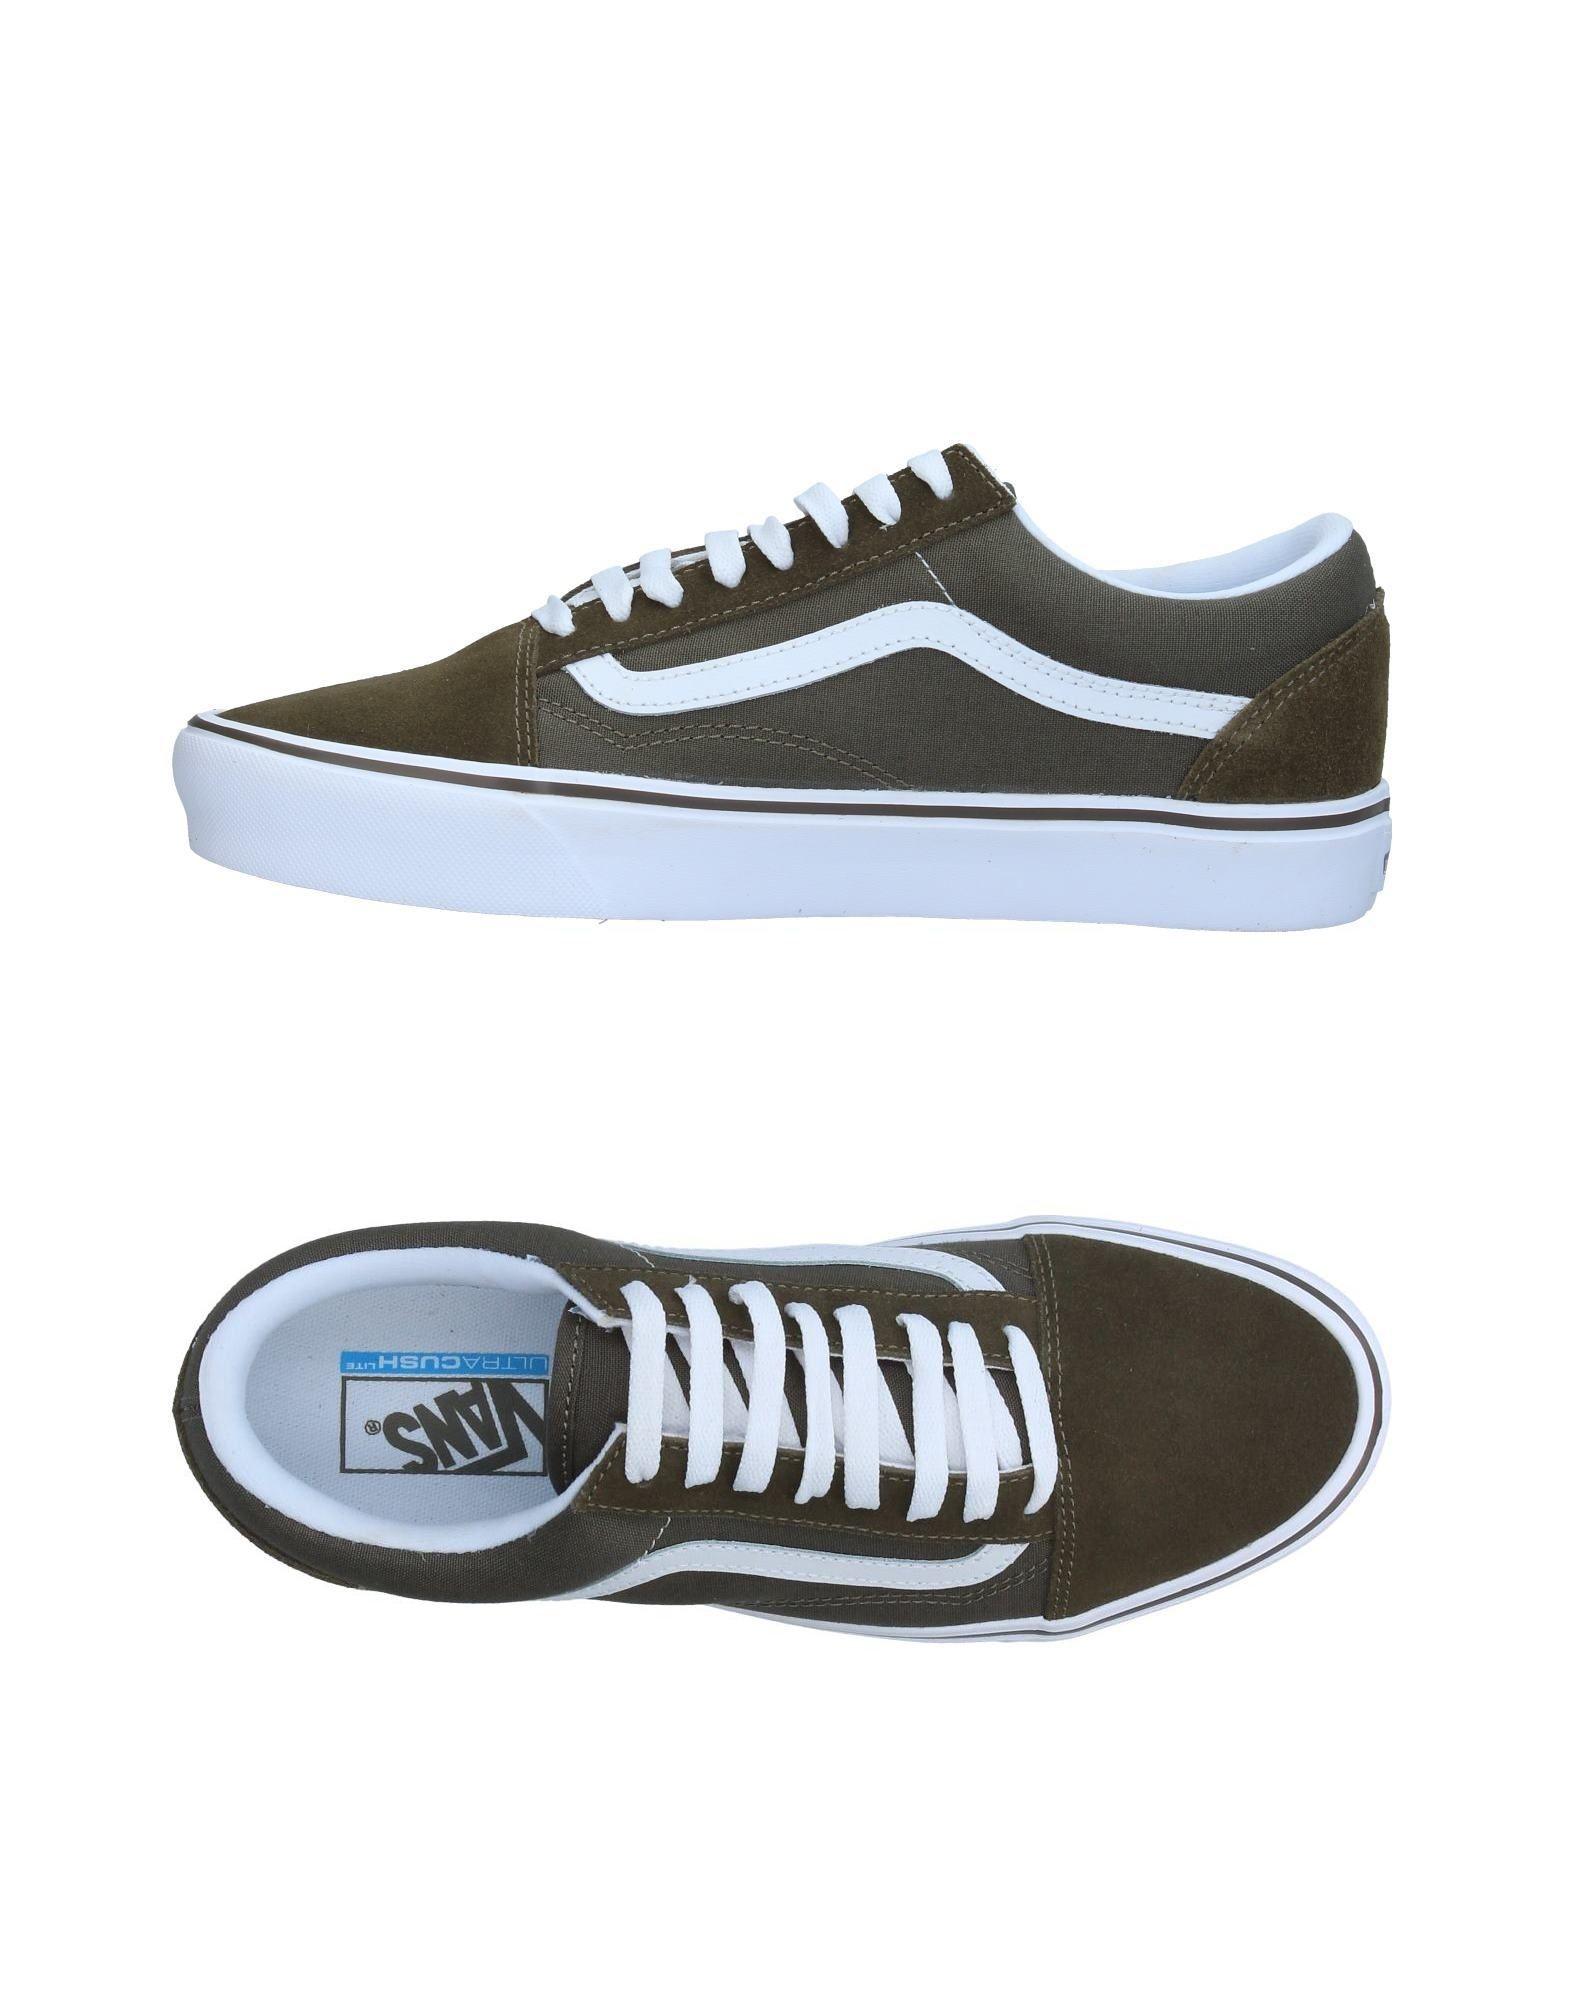 A buon mercato Sneakers Vans Uomo - 11376499PD